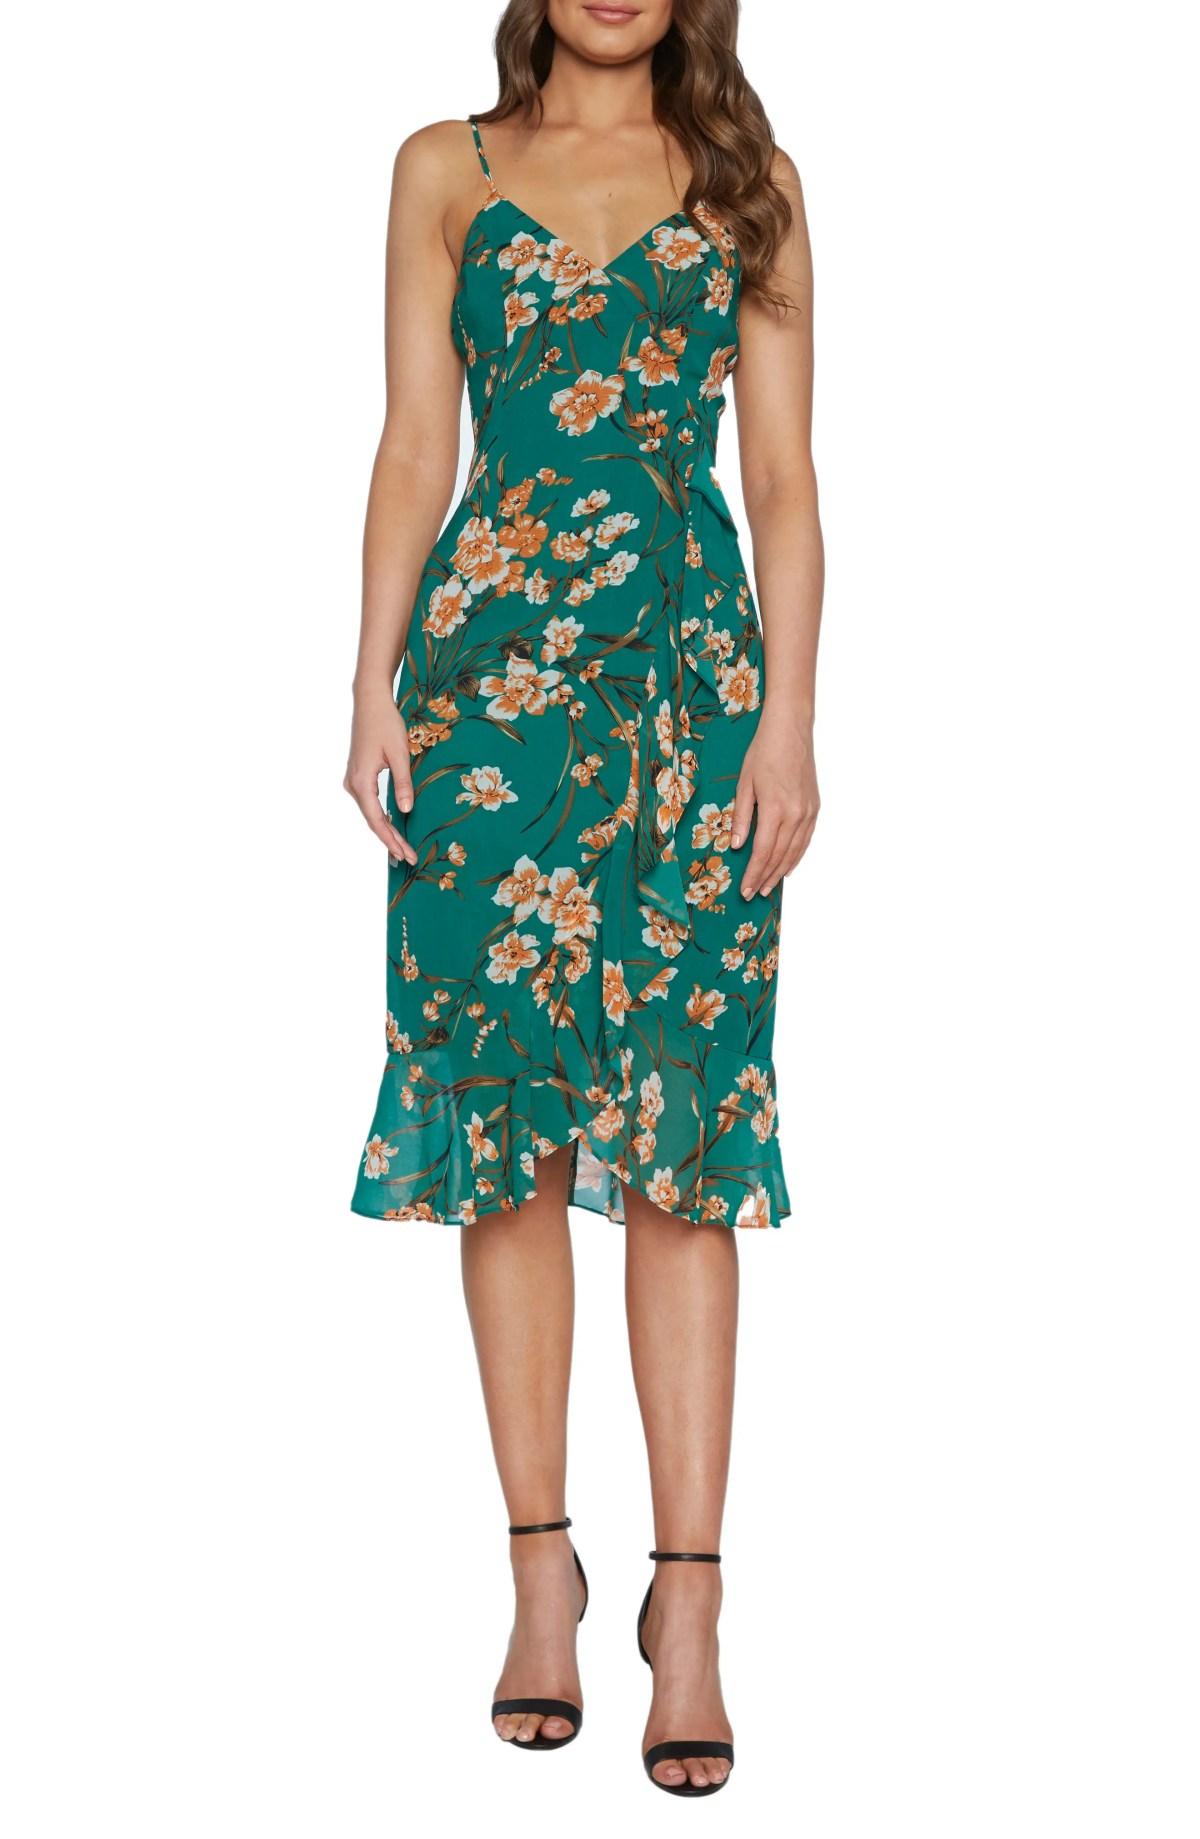 BARDOT Malika Floral Print Dress, Main, color, ORANGE FLORAL